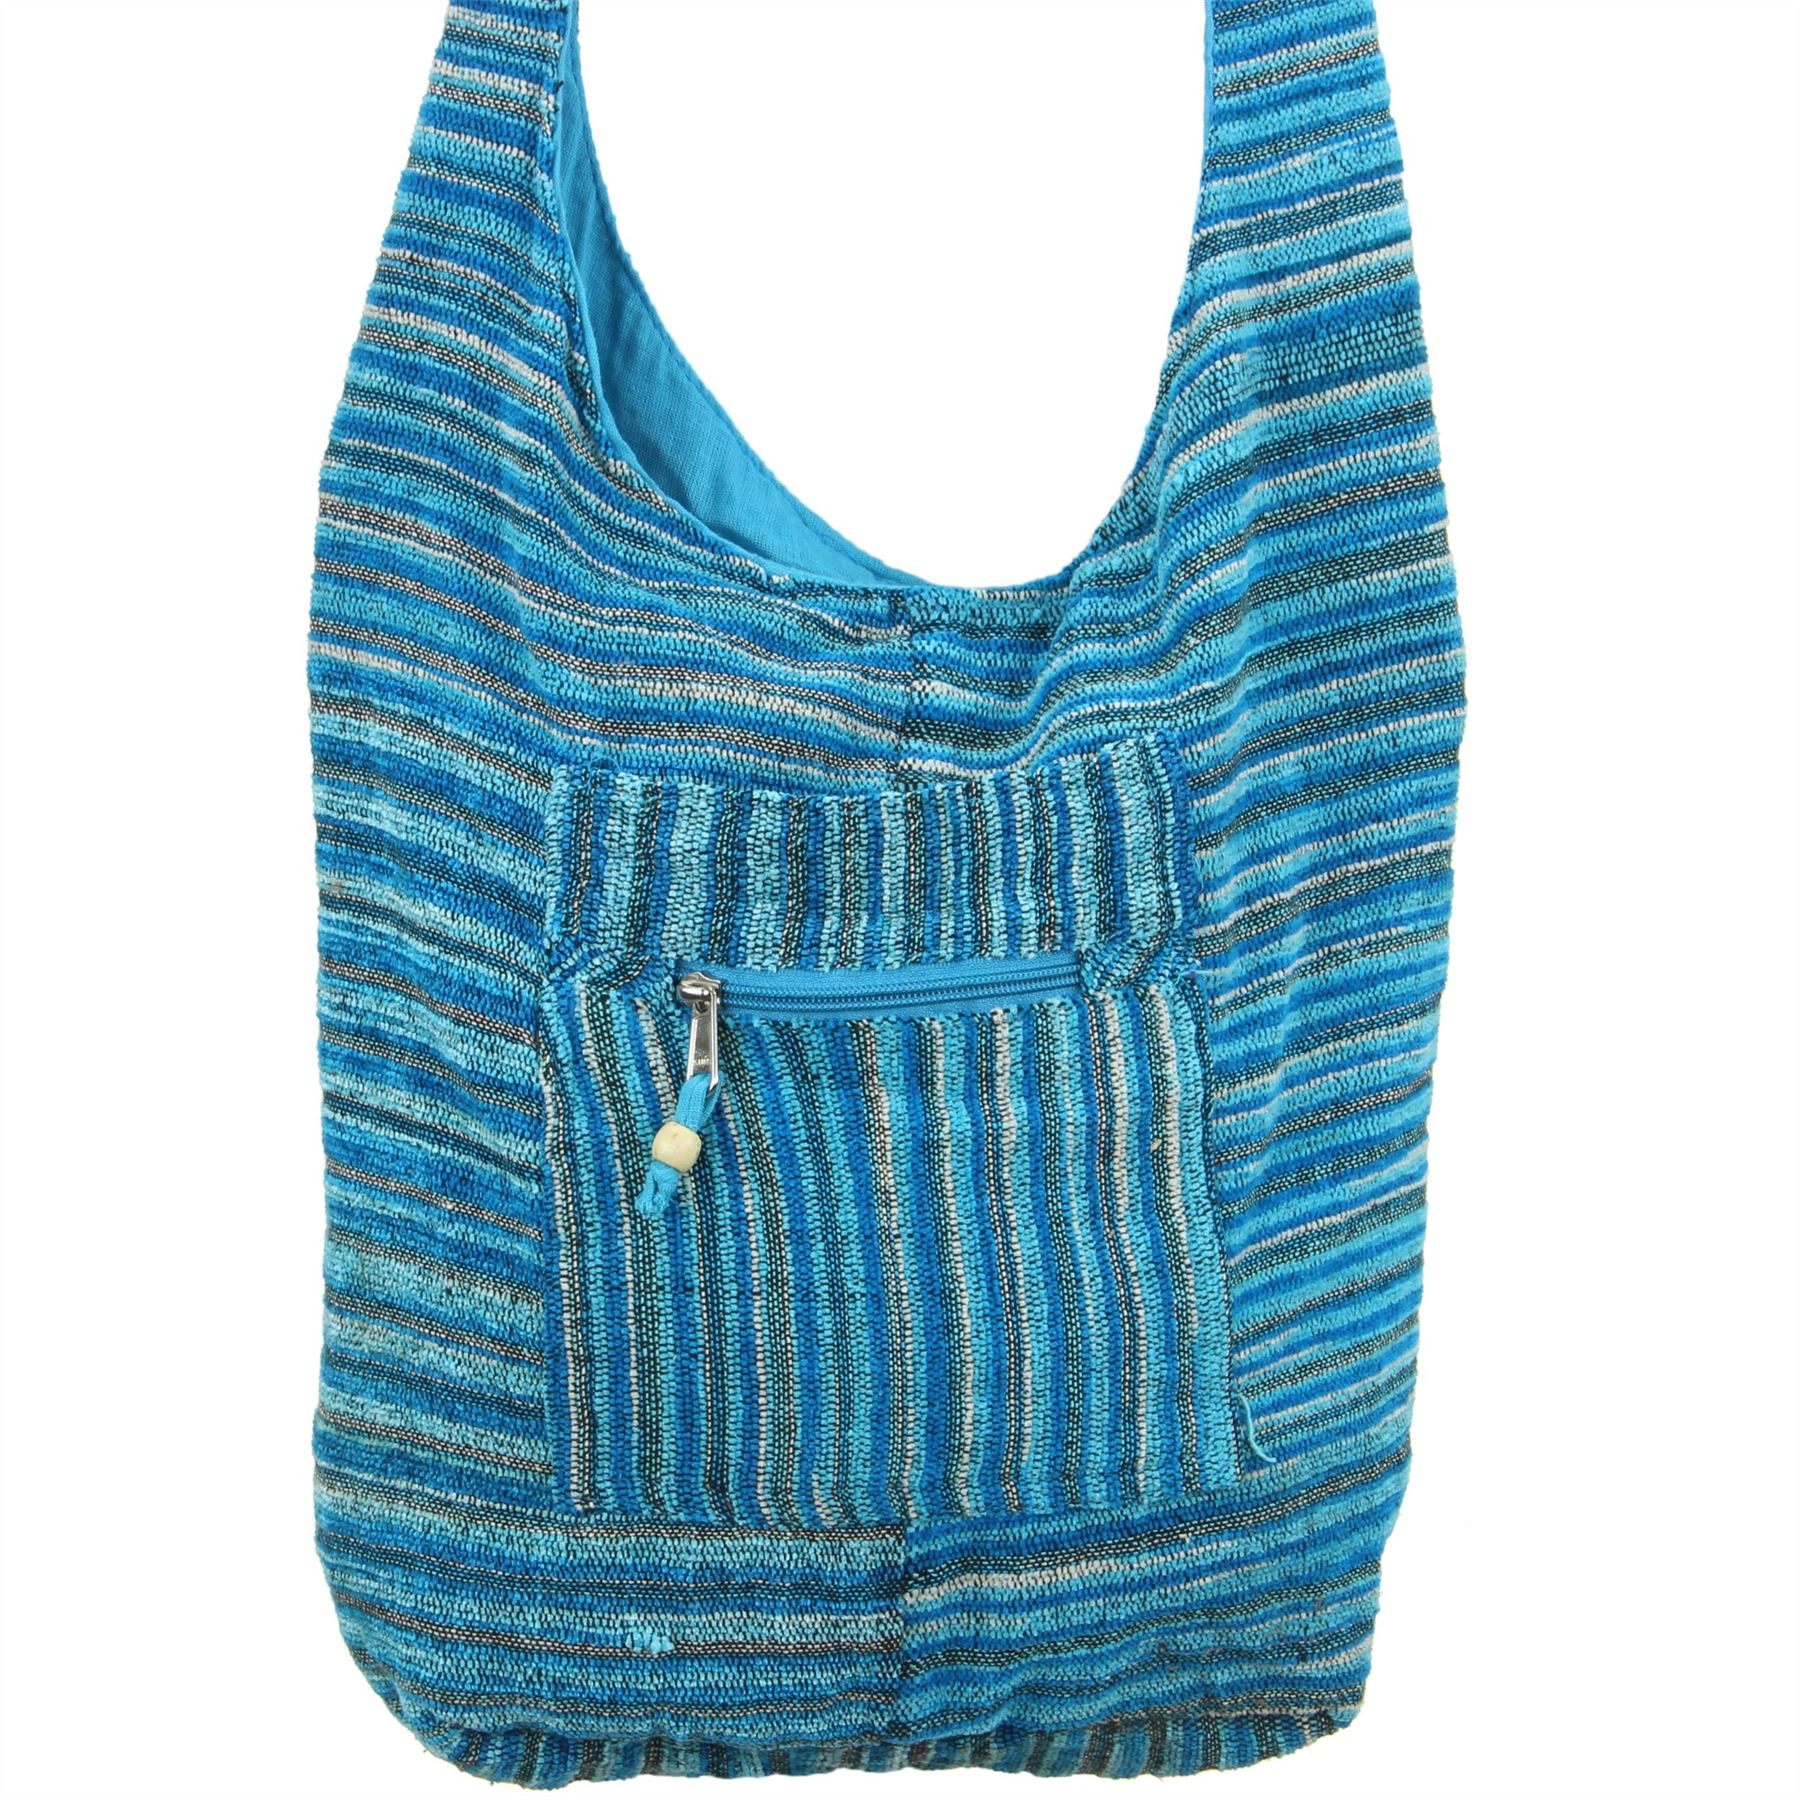 Sling-Bag-Chenille-Messenger-bandolera-cuerpo-transversal-Bolso-de-Mano-Bolso-Mochila-HOBO-HIPPIE miniatura 3